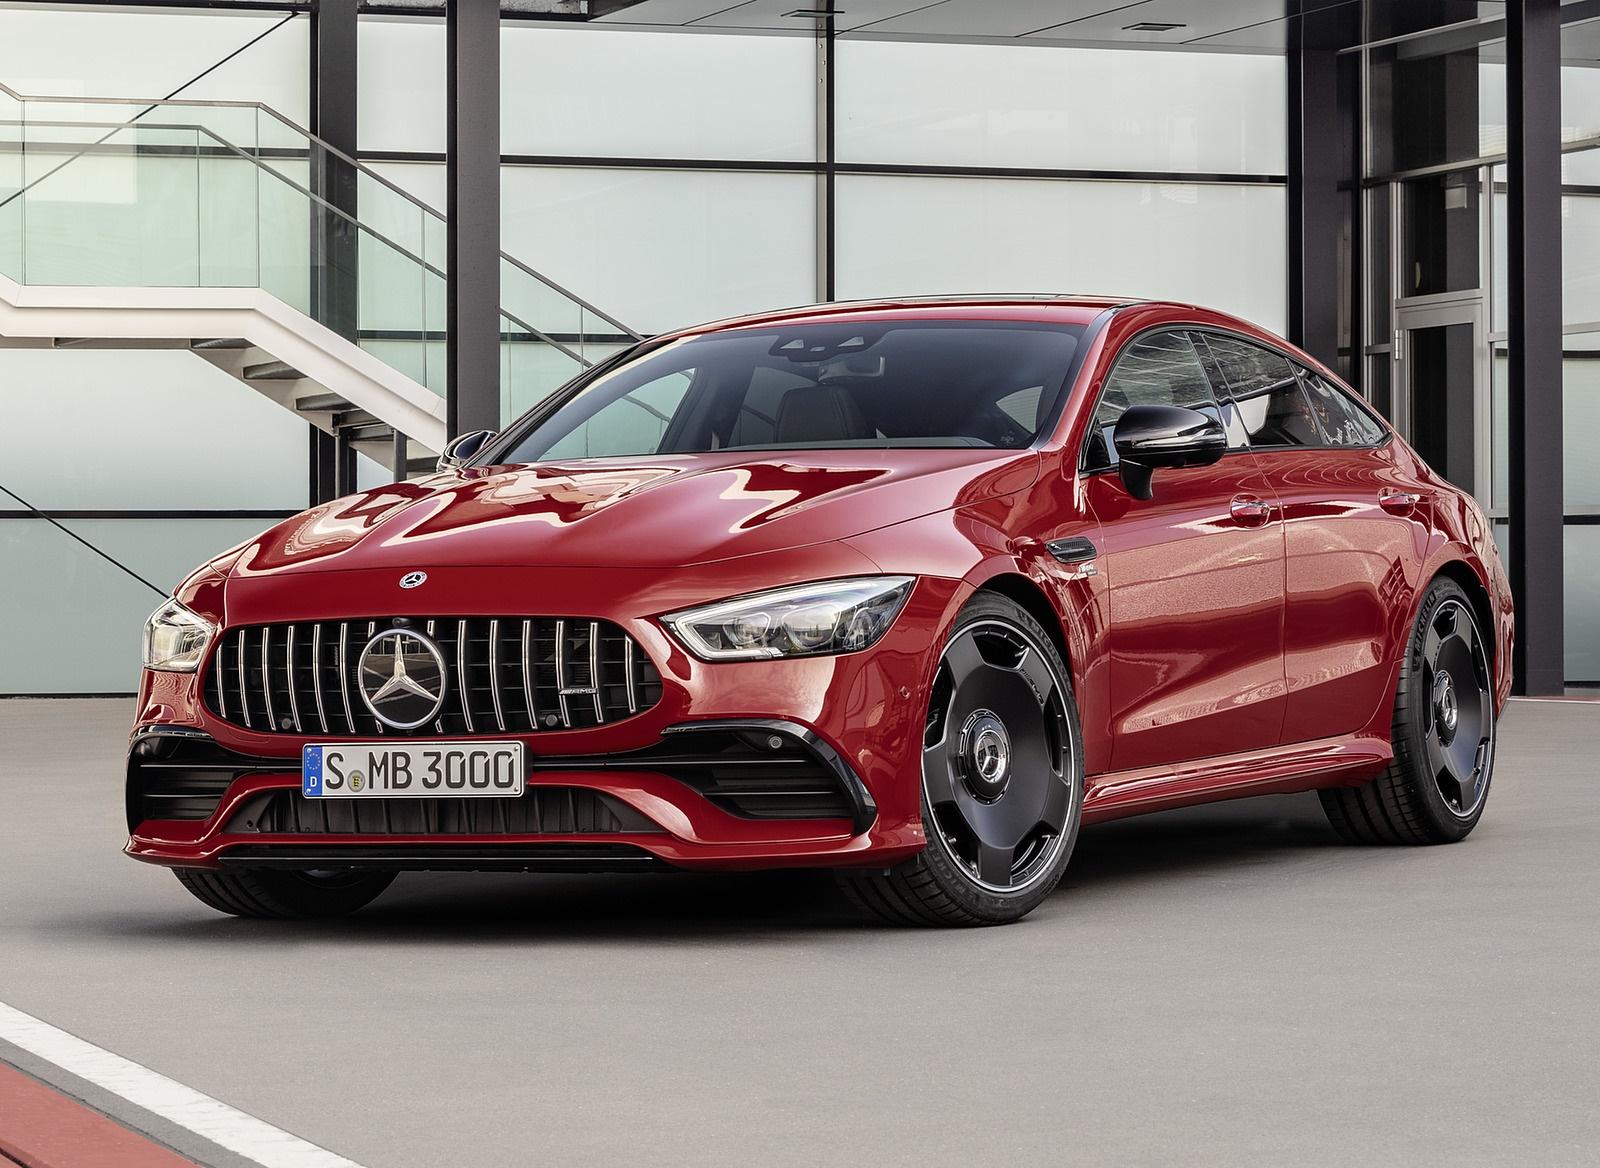 2019 Mercedes-AMG GT 43 4MATIC+ 4-Door Coupé (Color: Jupiter Red) Front Three-Quarter Wallpapers (5)